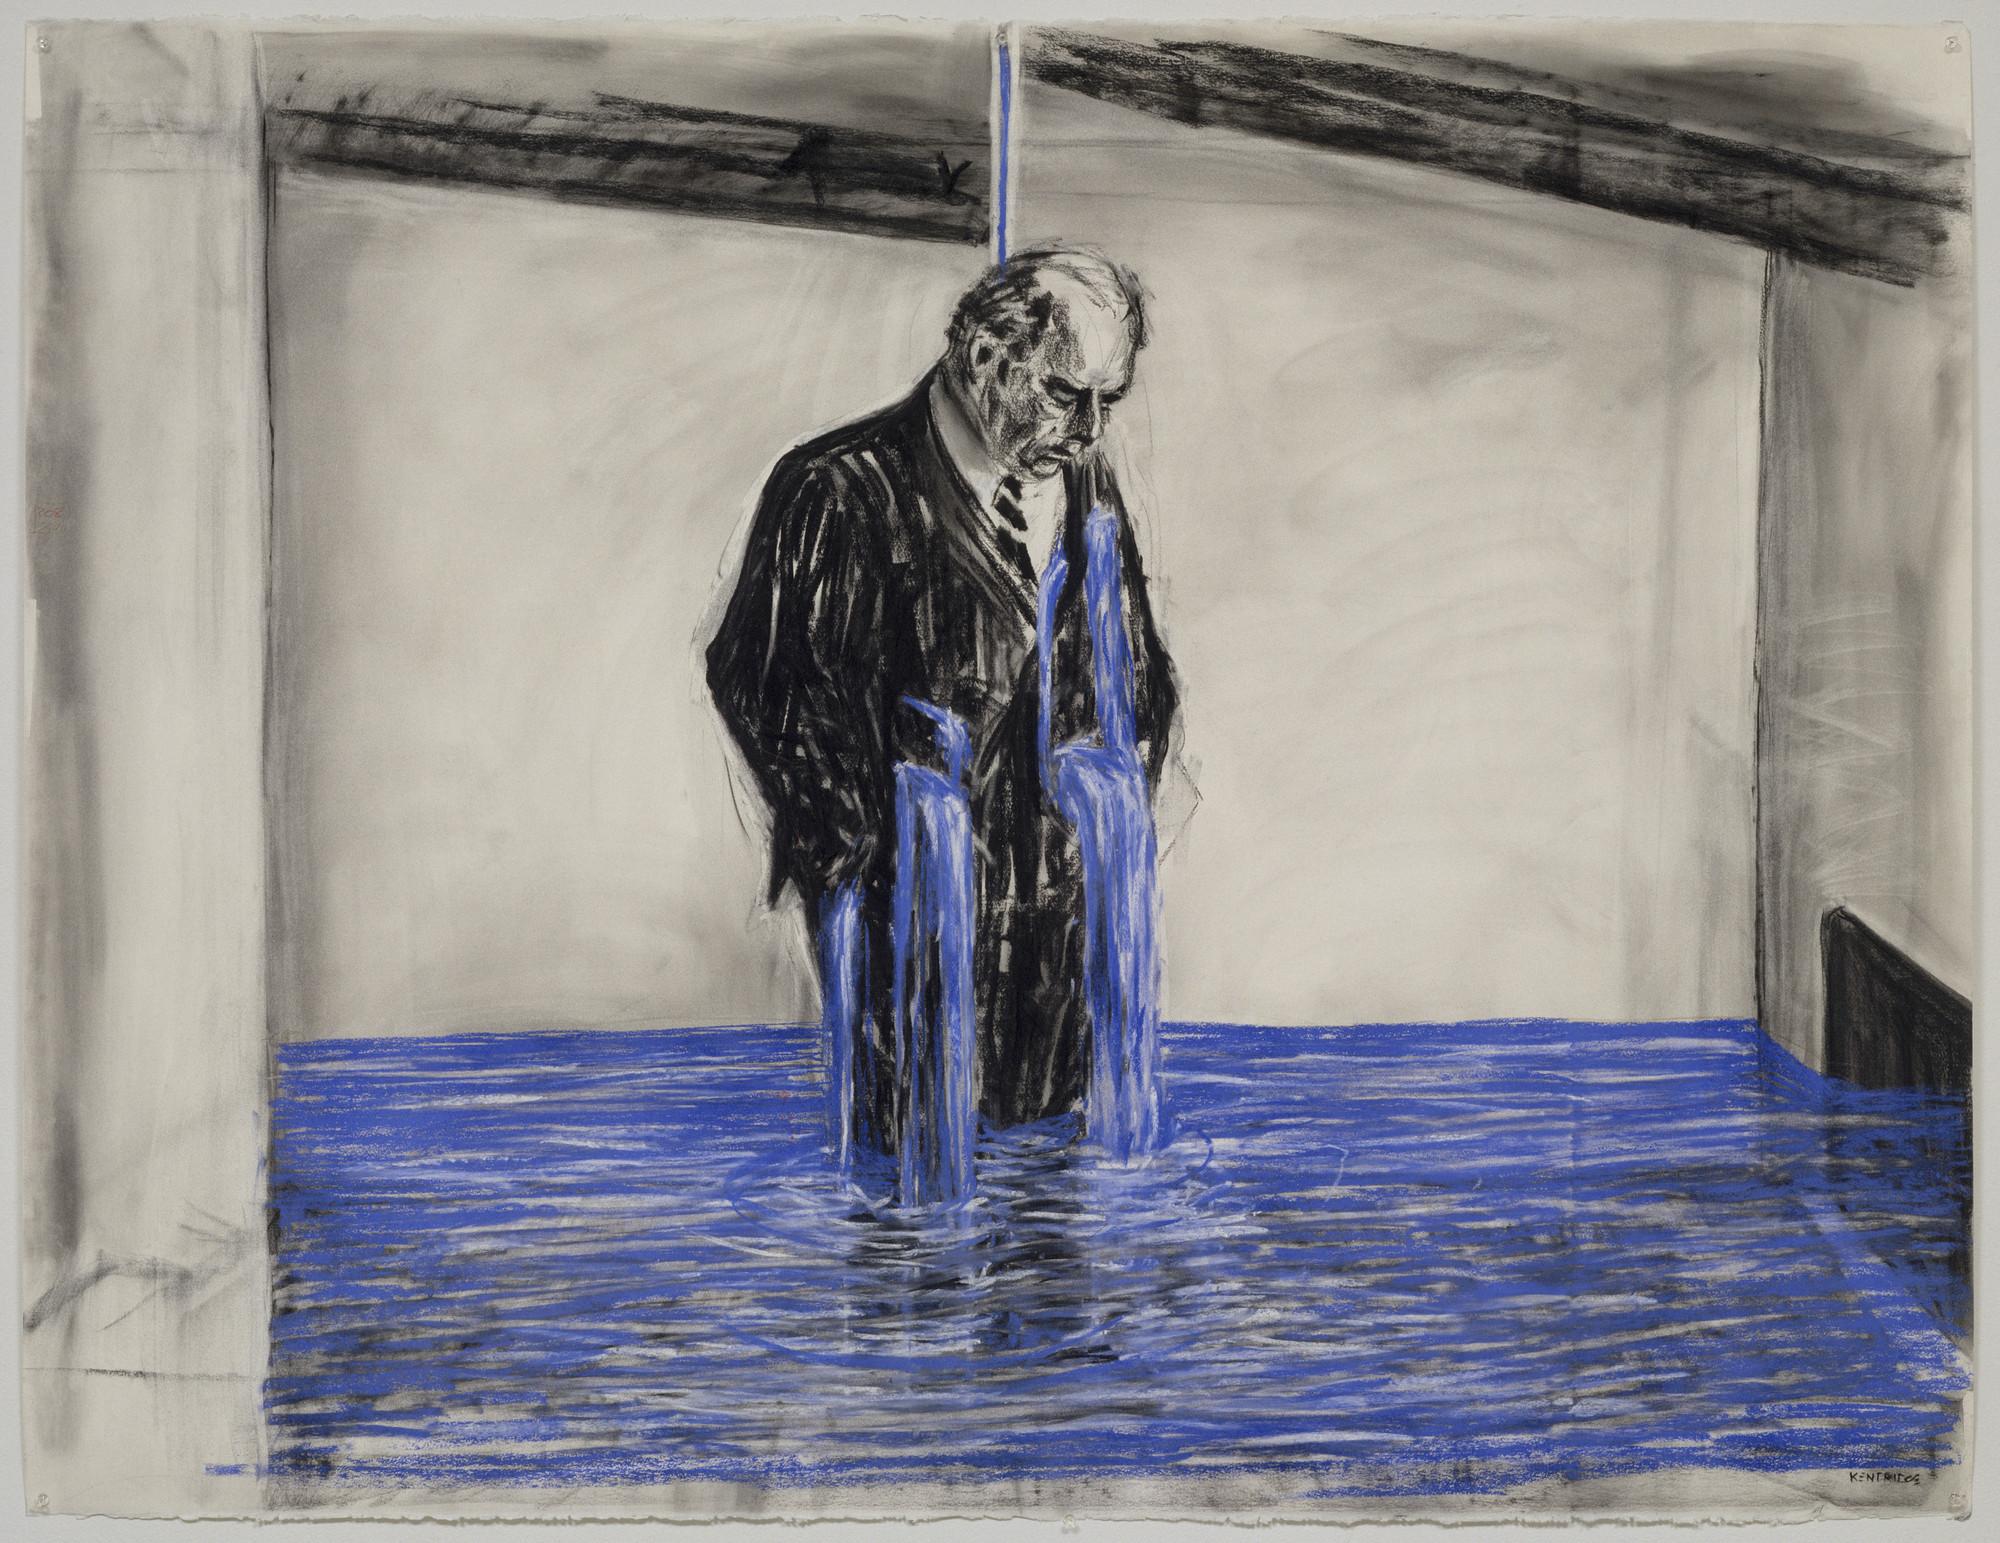 William Kentridge  Drawing from Stereoscope  (1998-99) | MoMA